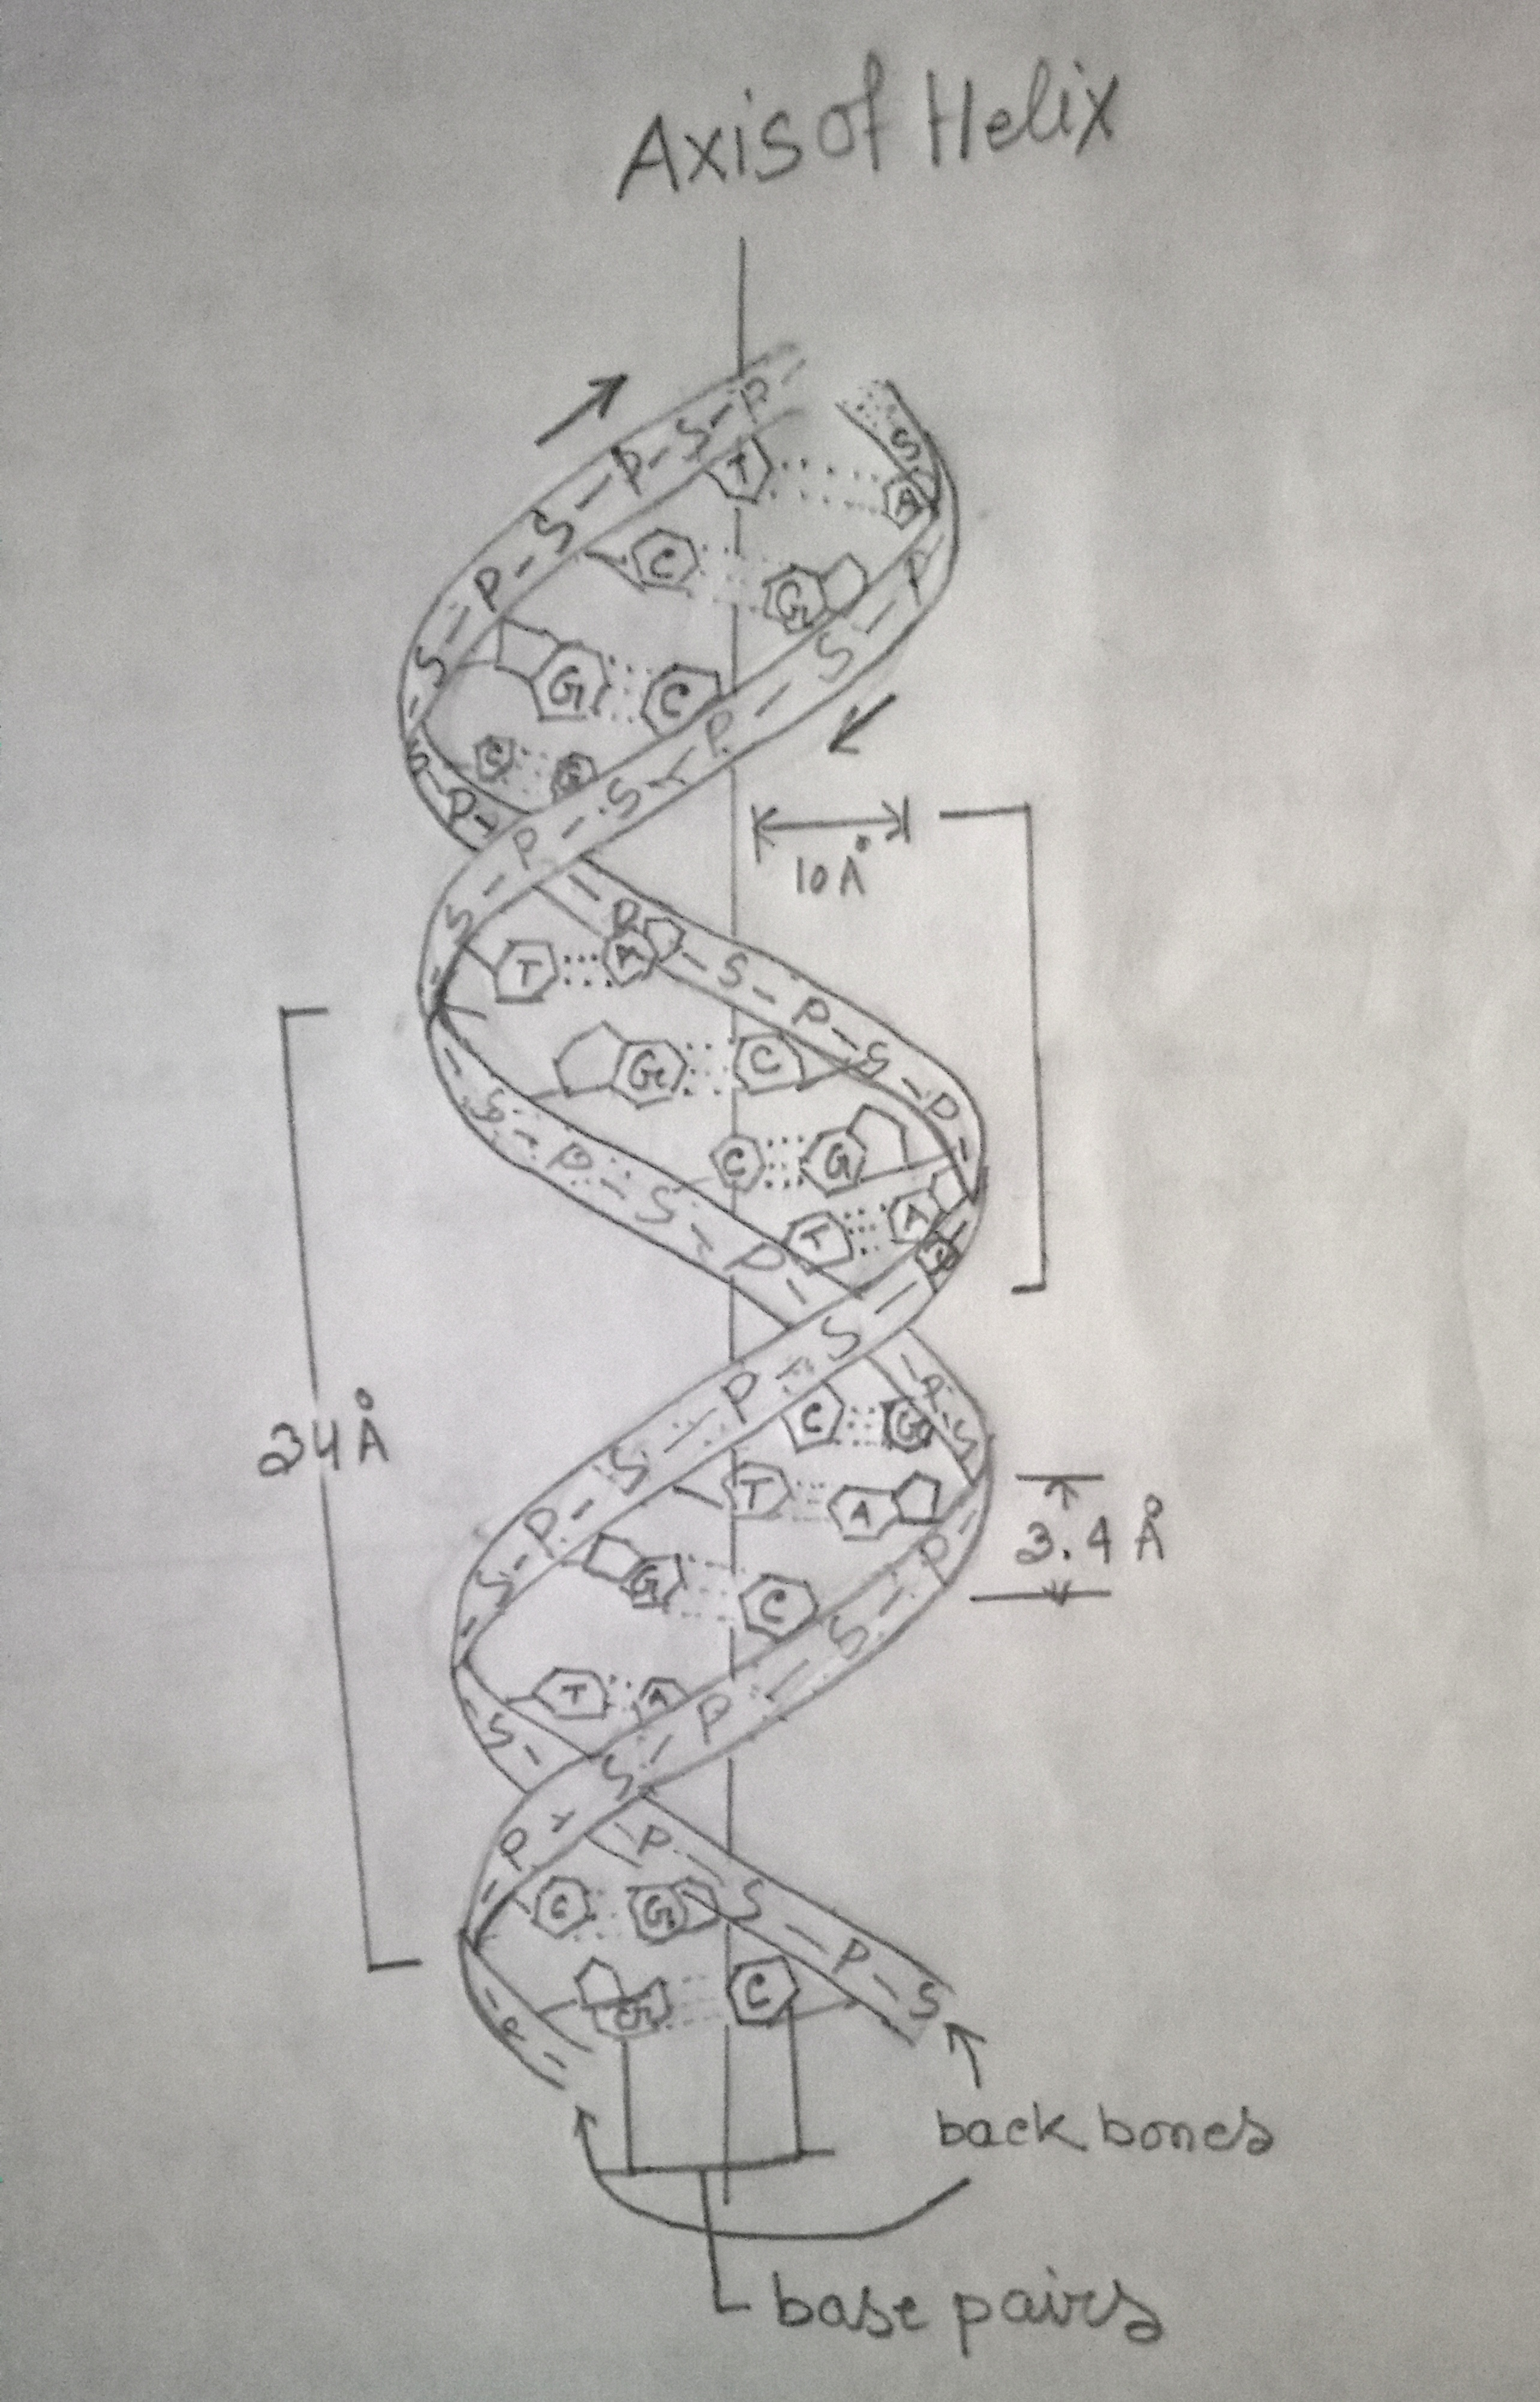 Diagrammatic representation of DNA double helix